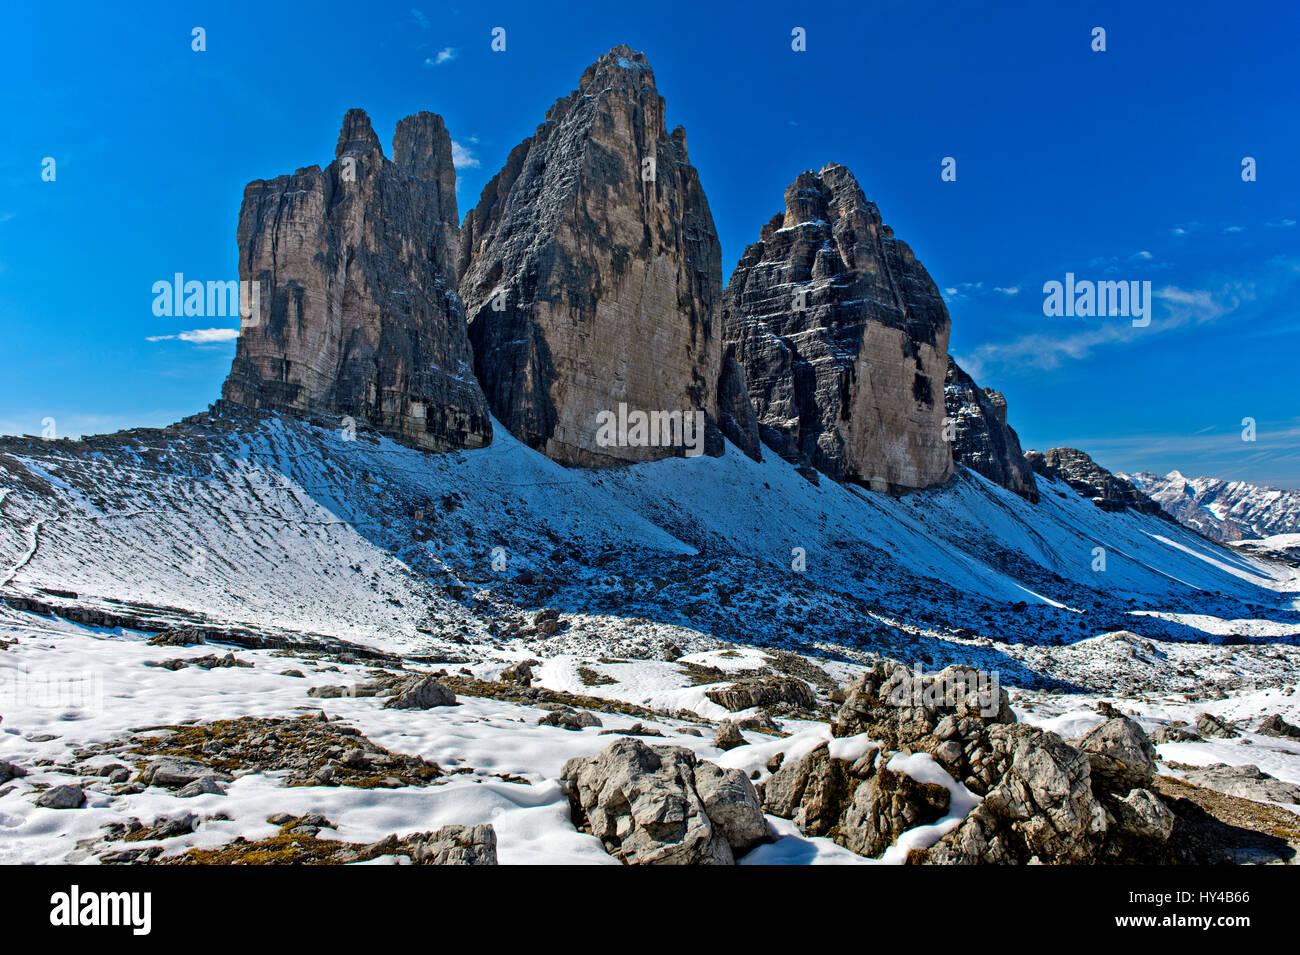 Natural Park Sesto Dolomites Immagini   Natural Park Sesto Dolomites ... 2a1c3da6e37